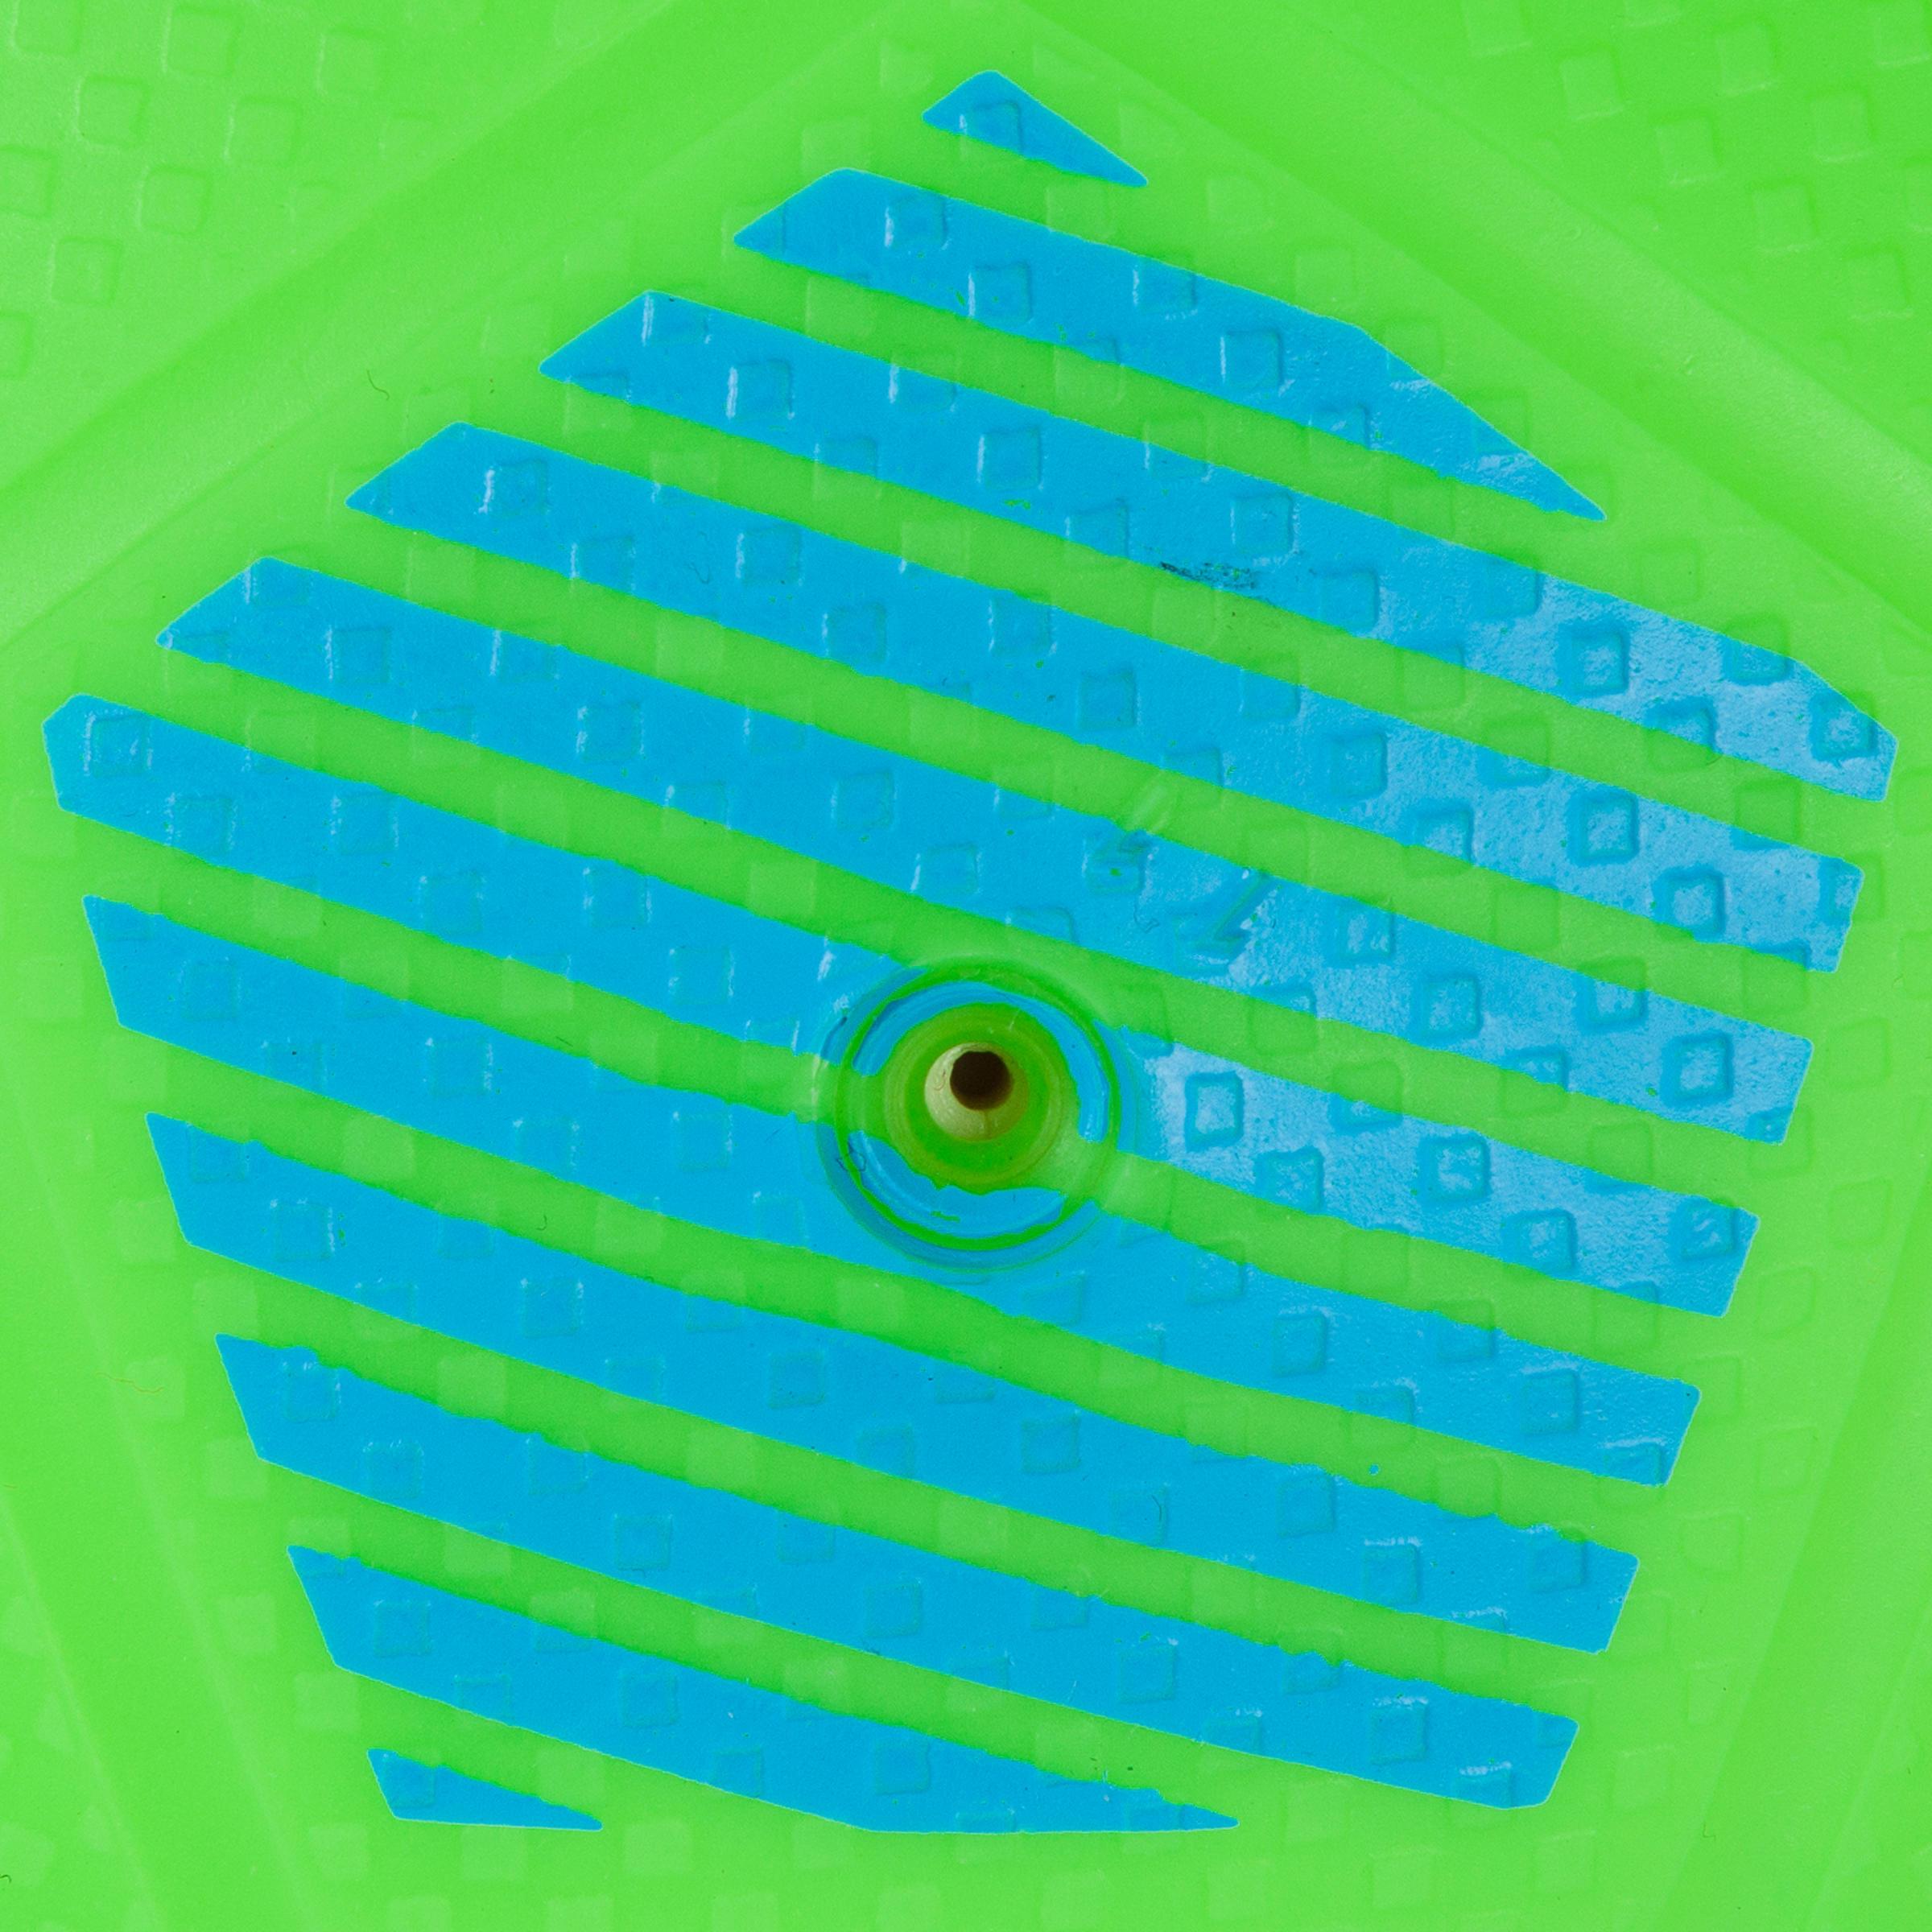 Sunny 300 Football Size 5 - Green/Blue